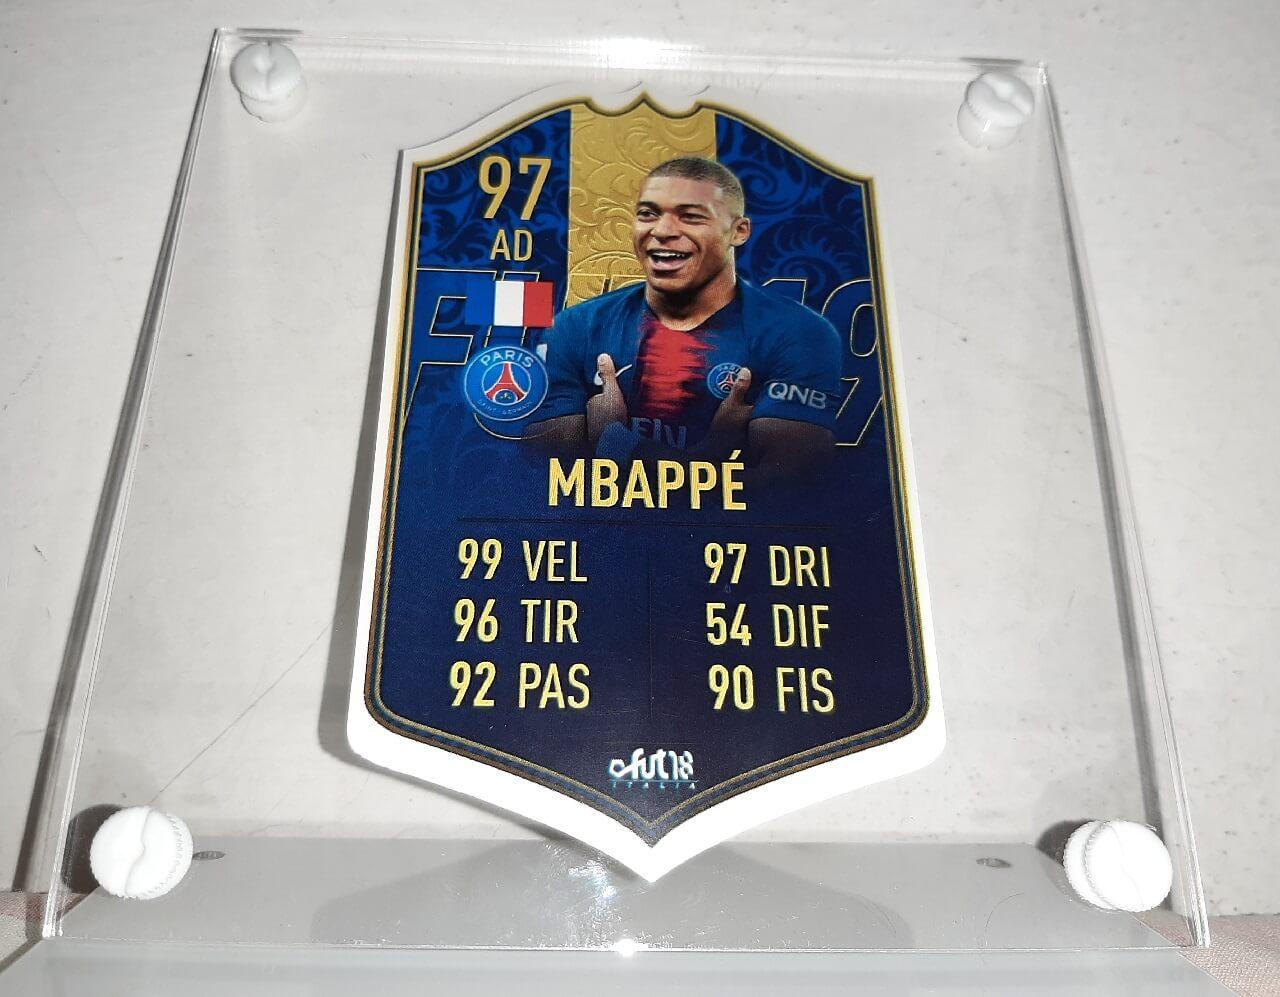 Mbappé TOTY card personalizzata, la stampa